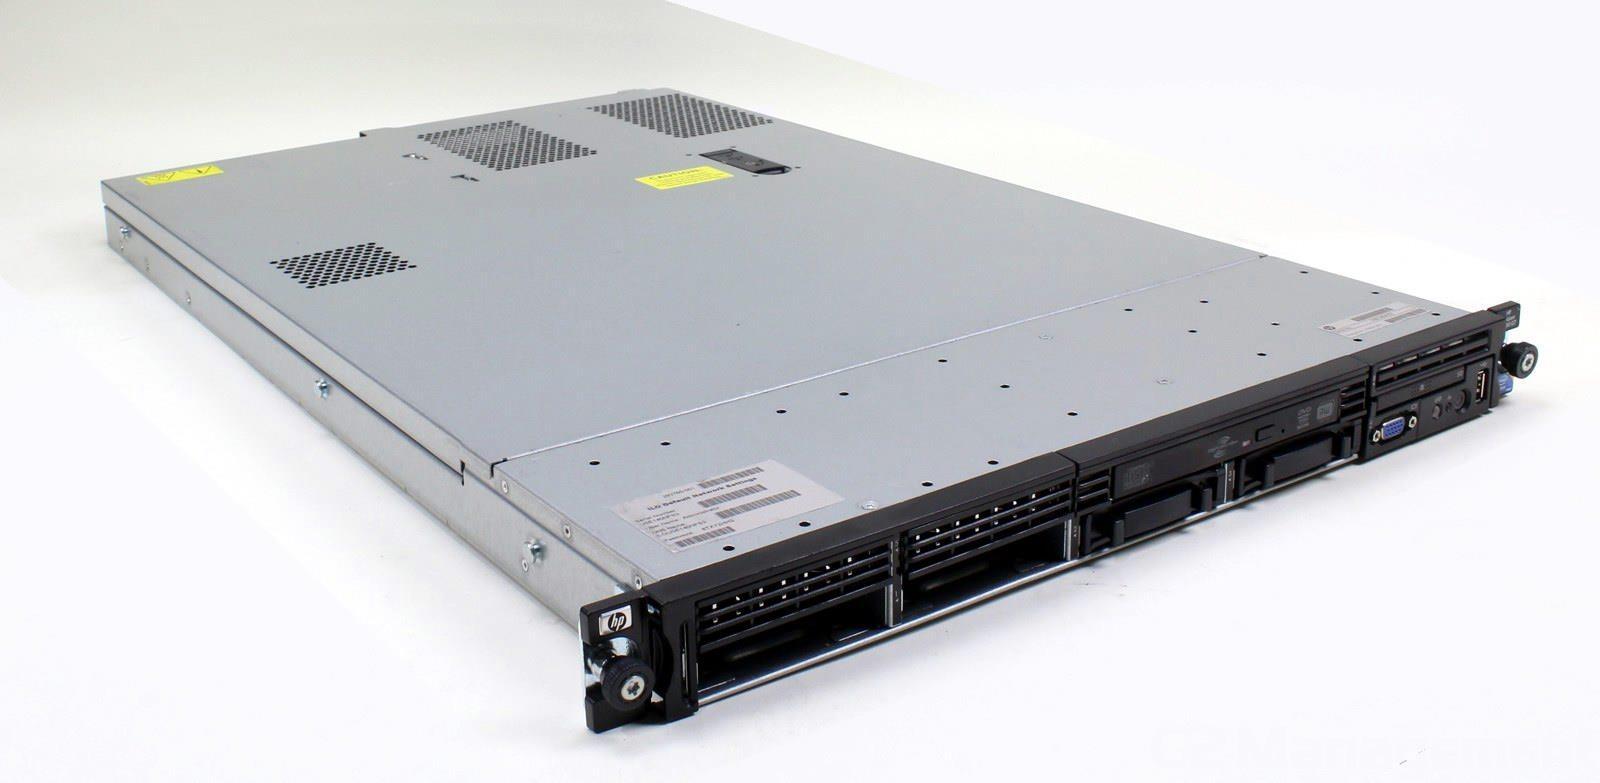 Hp Proliant Dl360 G7 1u Rackmount Server With 2xsix Core